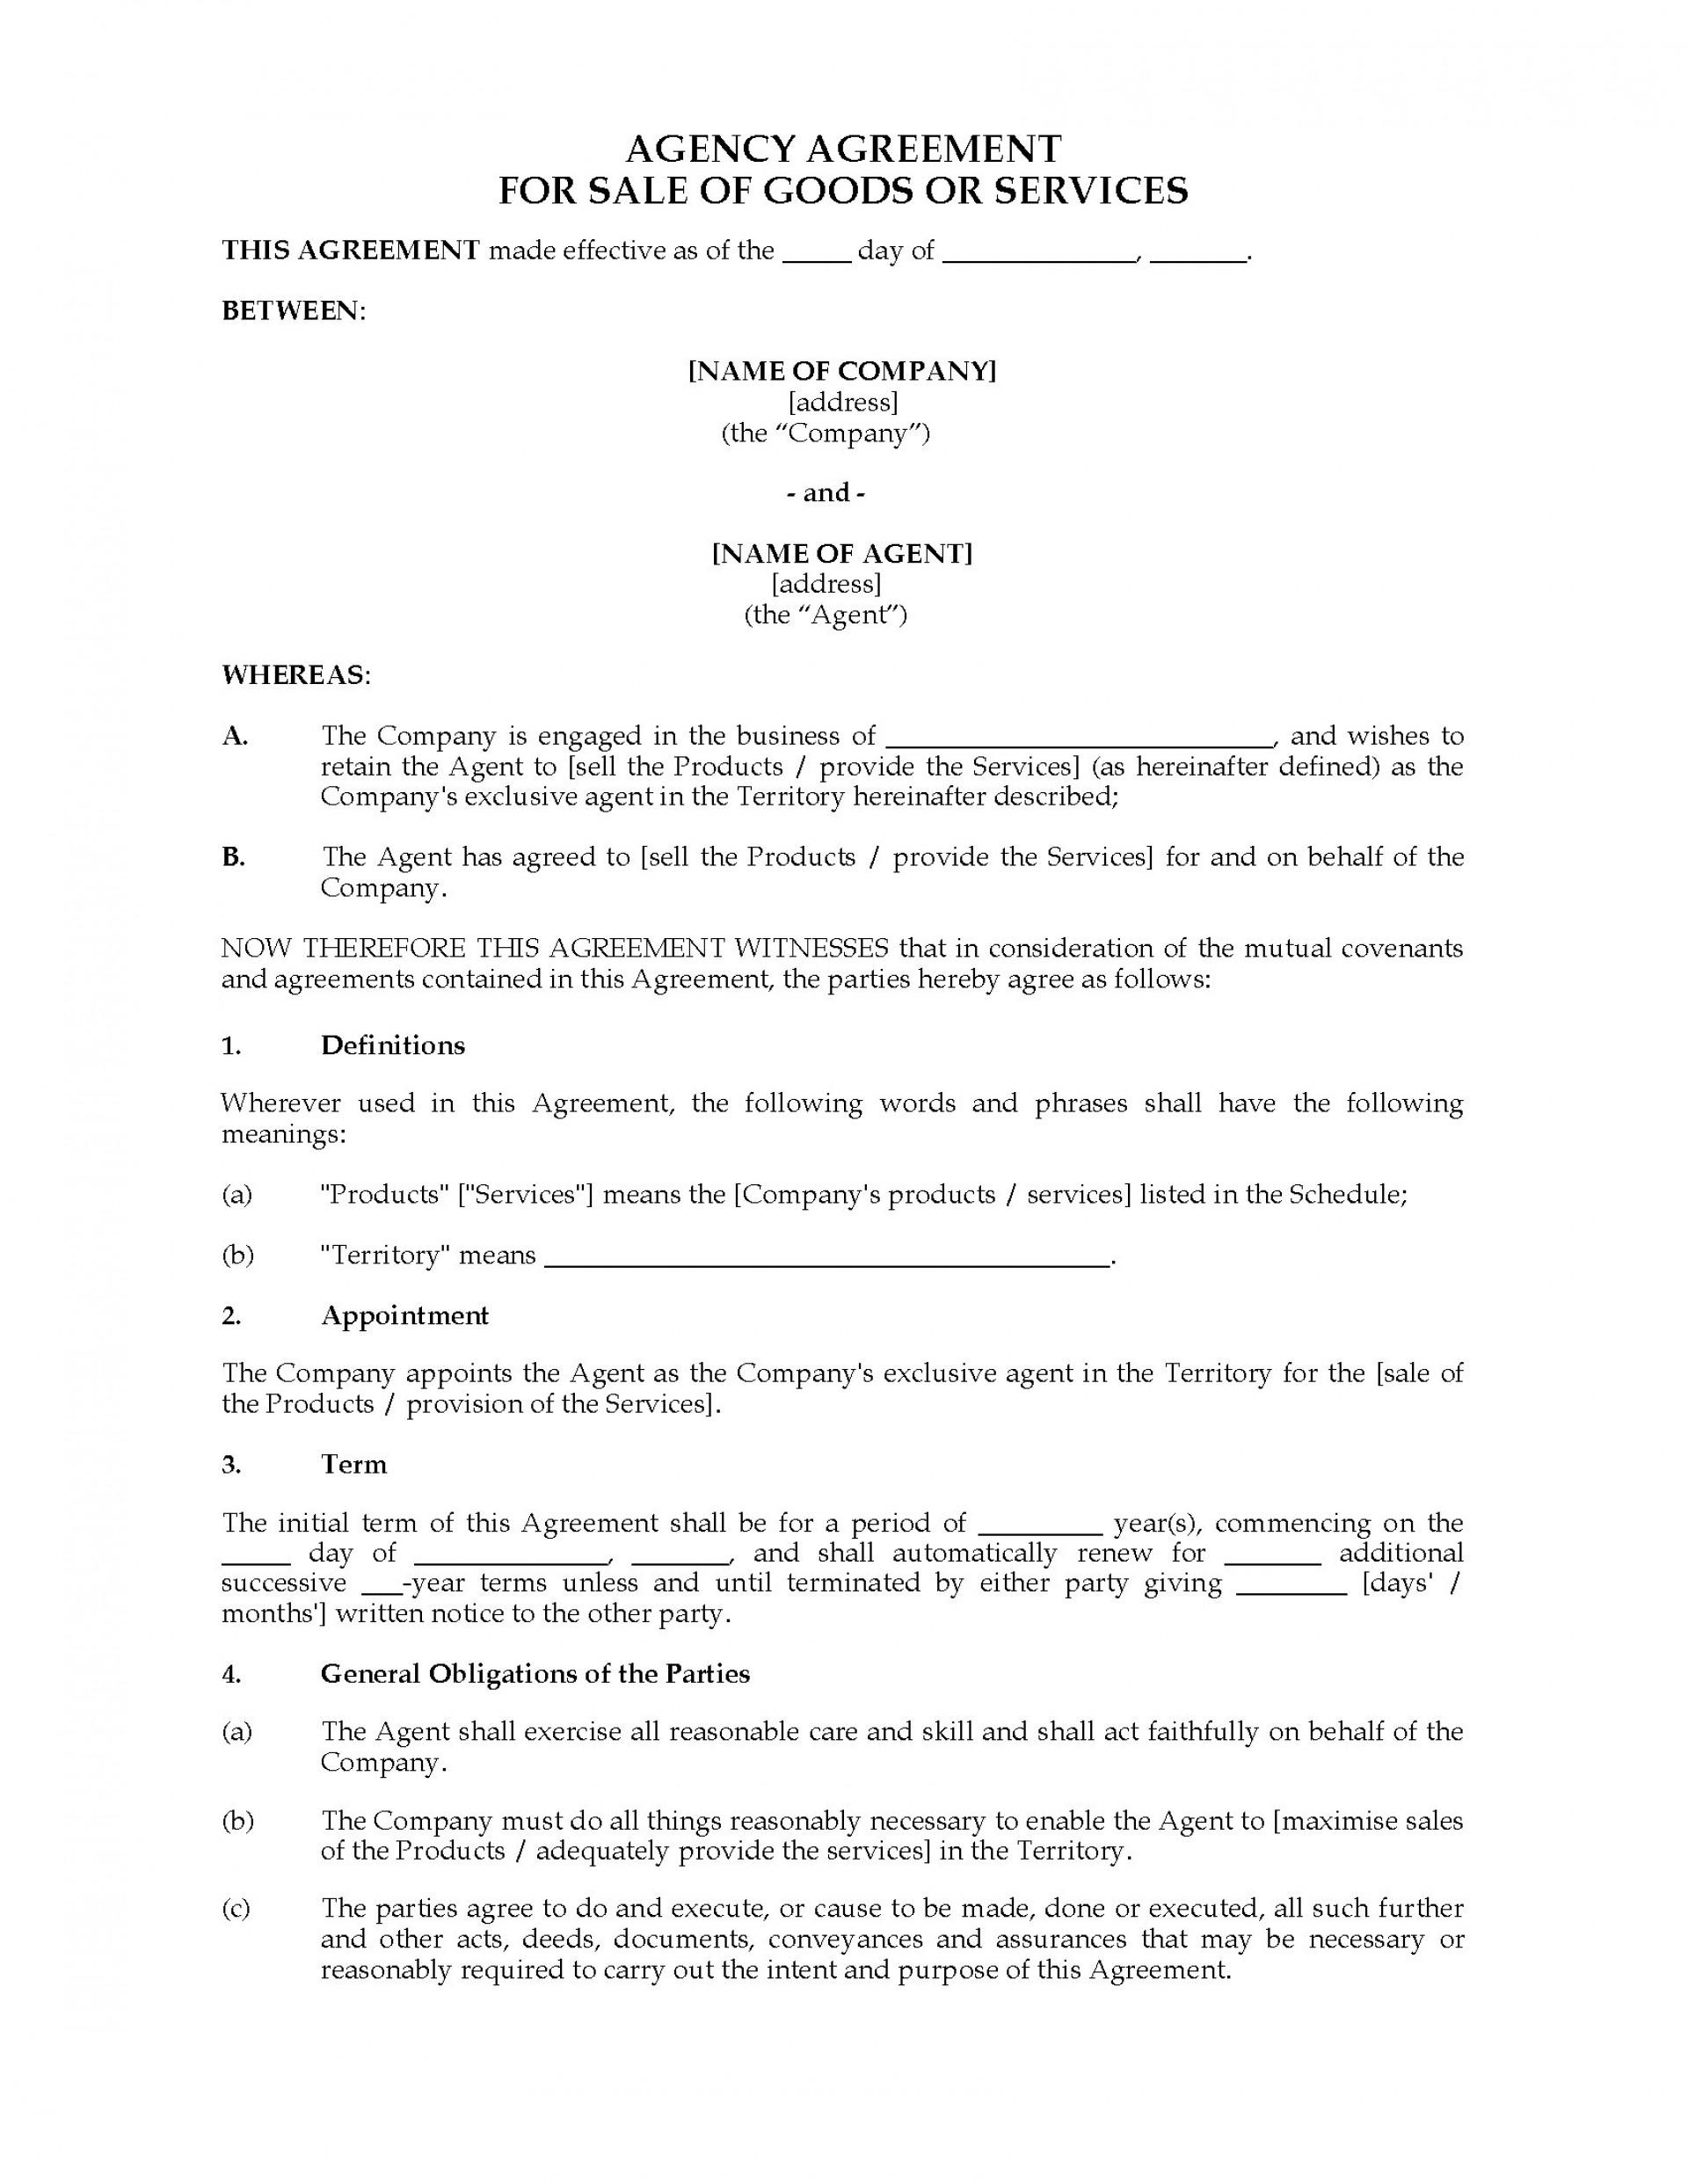 003 Magnificent Sale Agreement Template Australia Idea  Busines Horse Car Contract1920